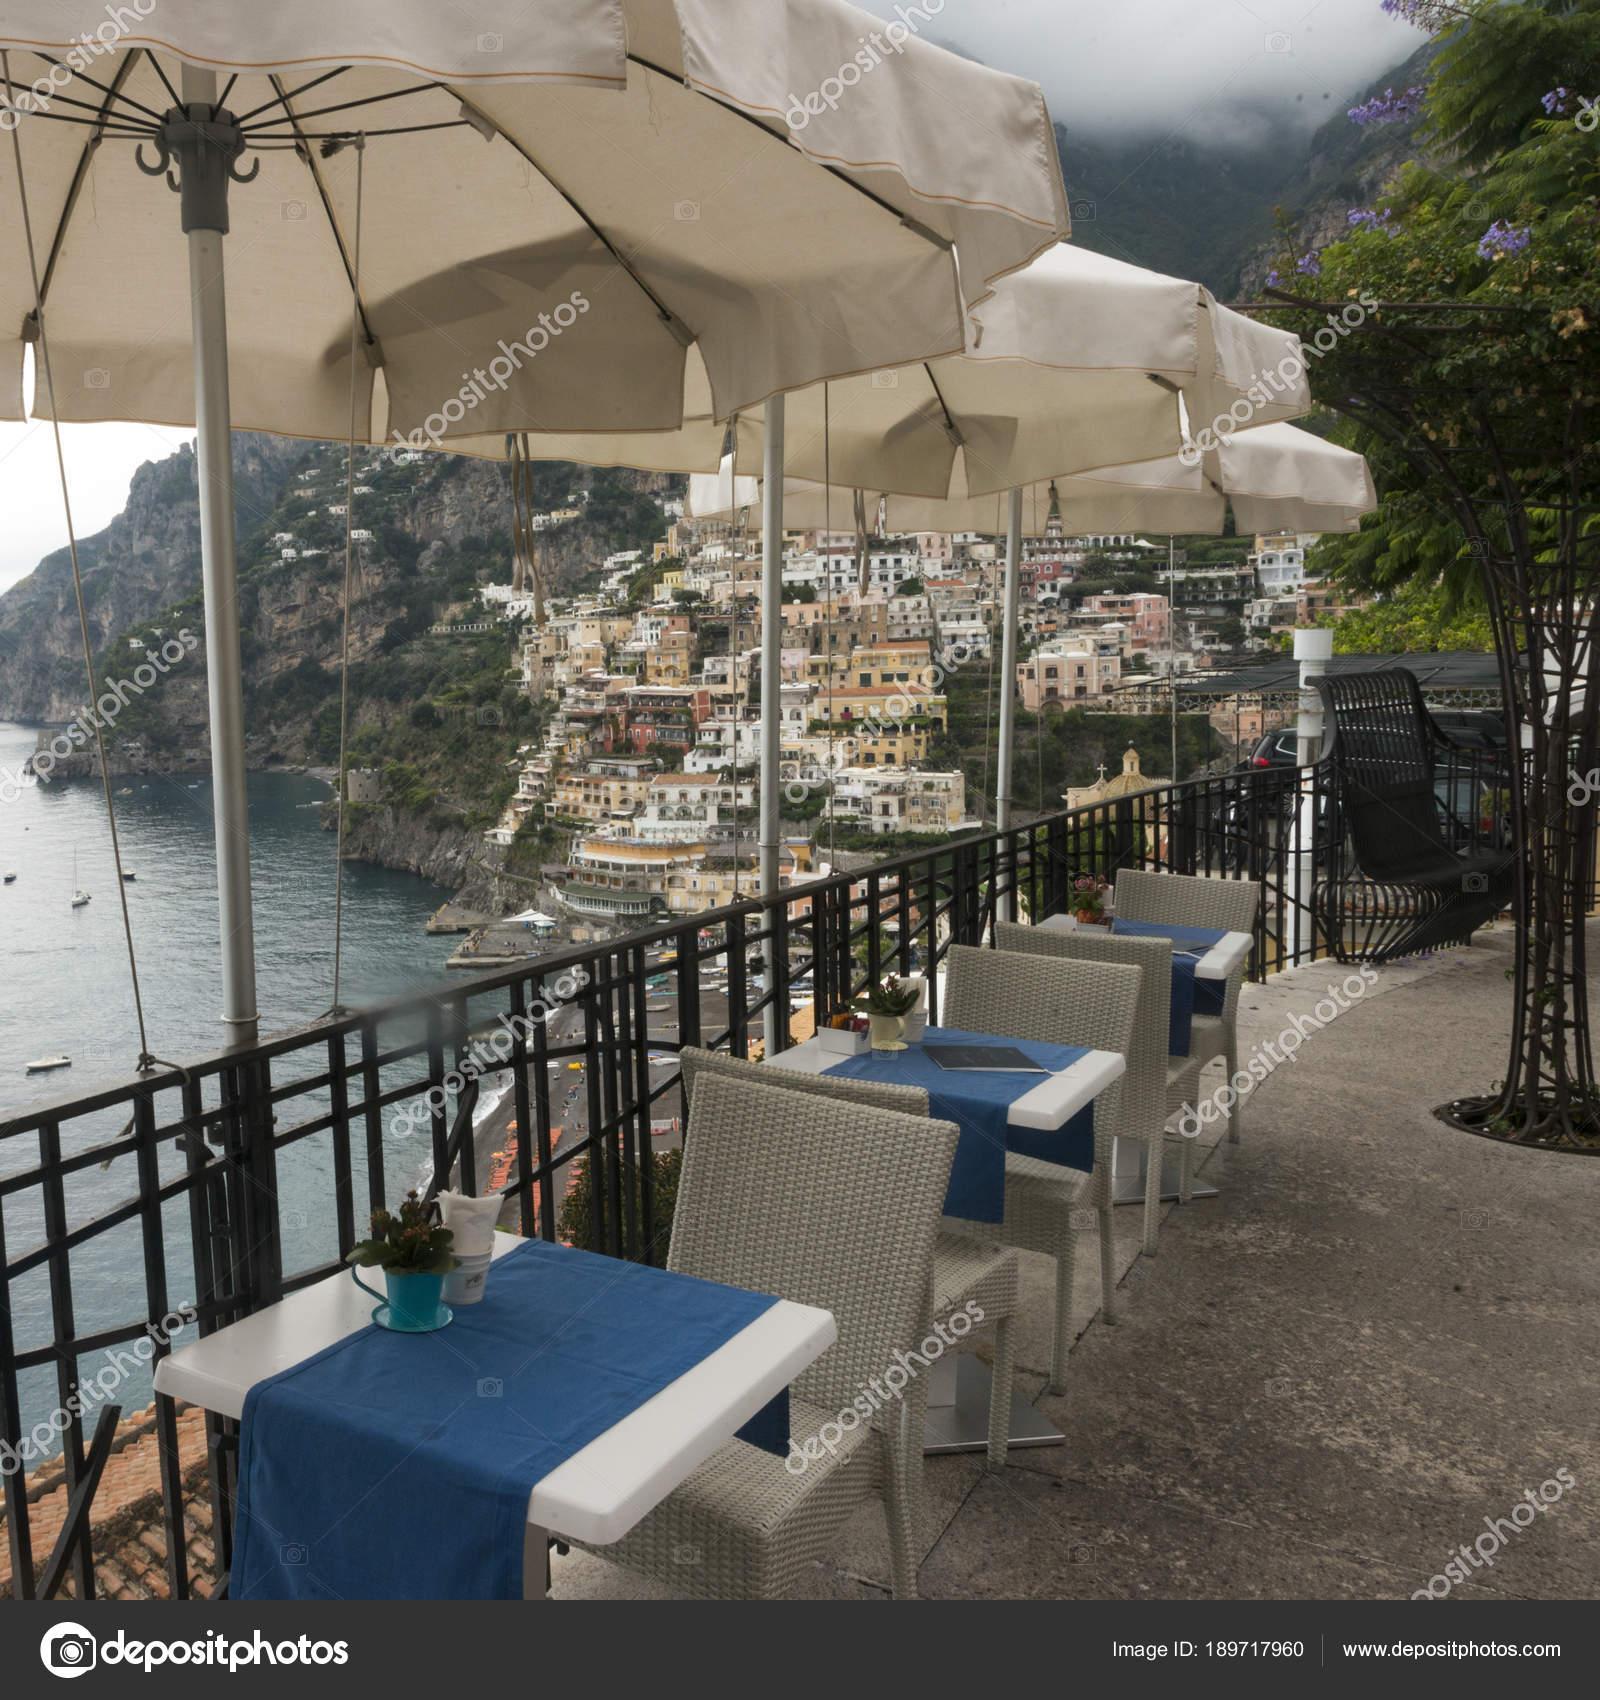 Empty Chairs Tables Patio Umbrellas Terrace Positano Amalfi Coast Salerno Stock Photo C Klevit Shaw Ca 189717960